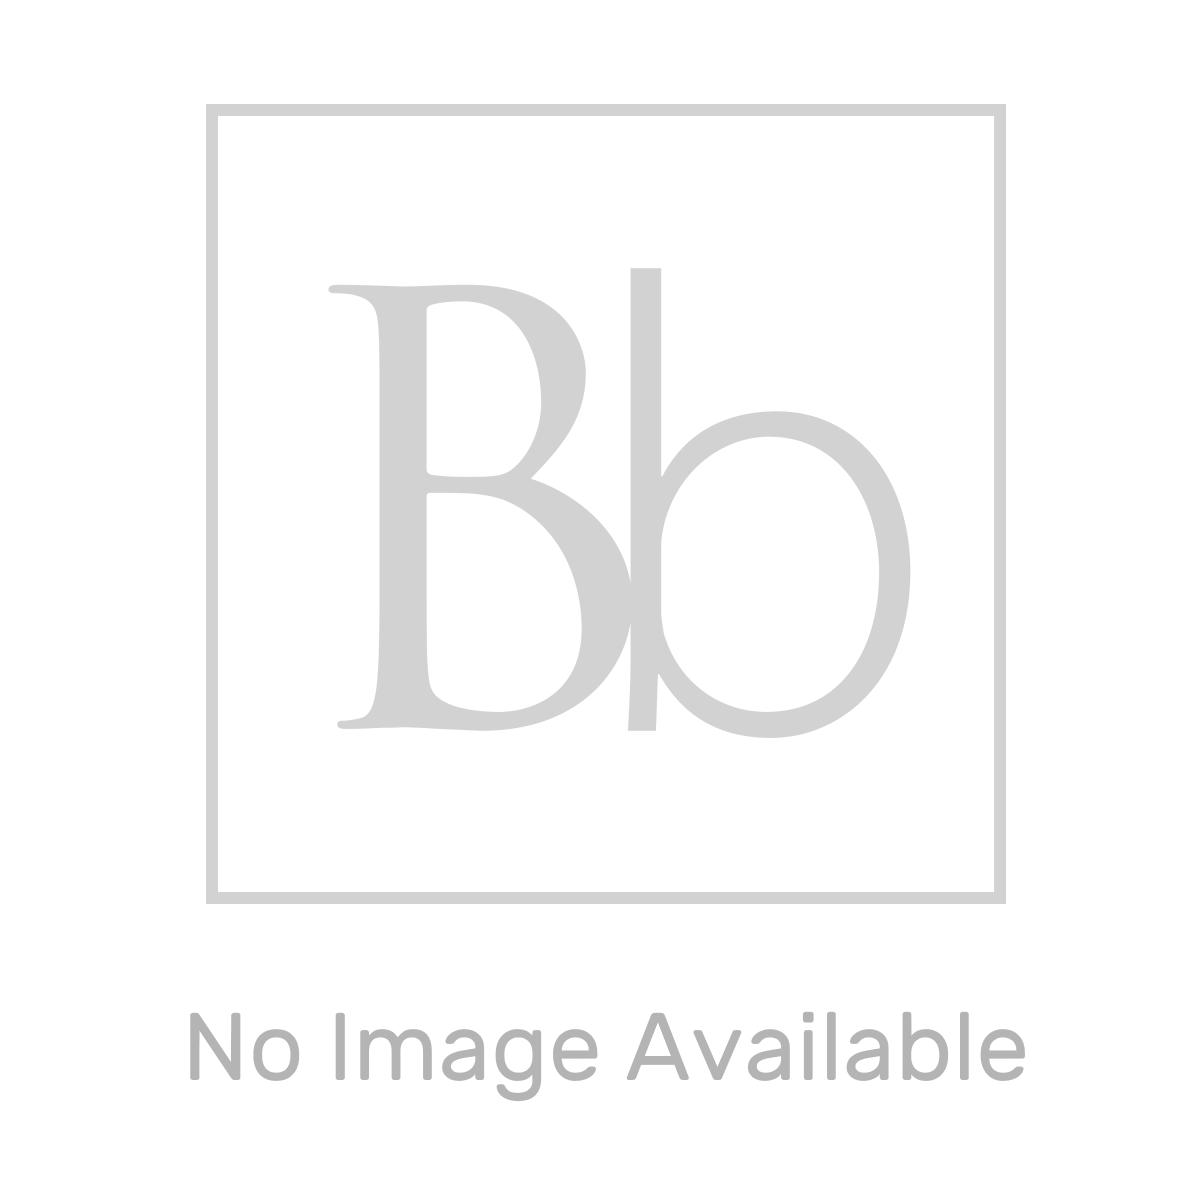 Bathrooms To Love Rectangular Single Ended Bath 1700mm x 750mm